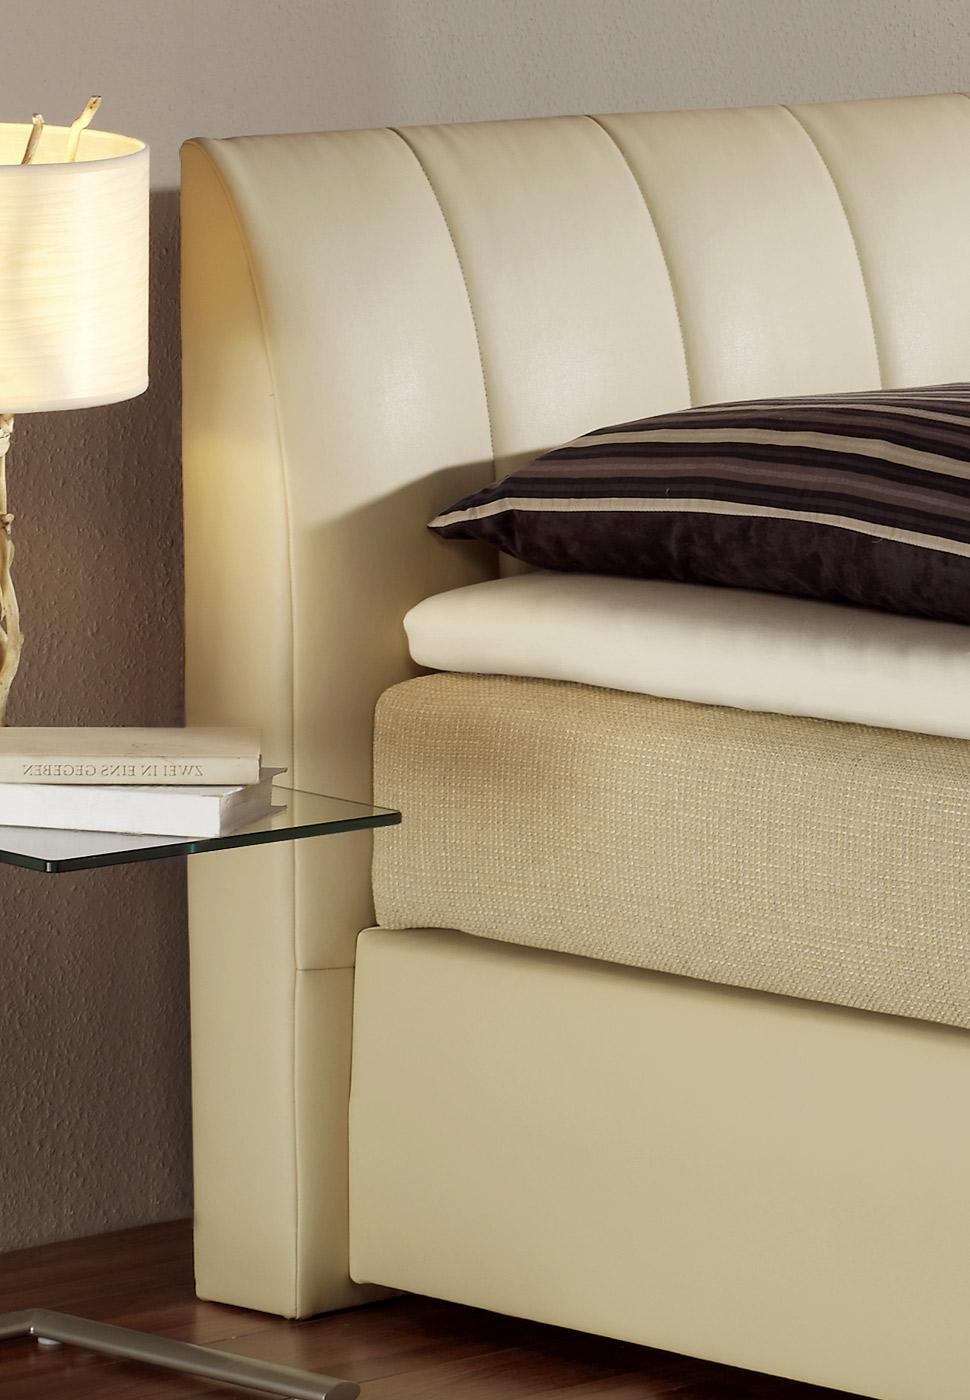 bett mit spring box und kunstlederbezug boxspringbett sydney. Black Bedroom Furniture Sets. Home Design Ideas